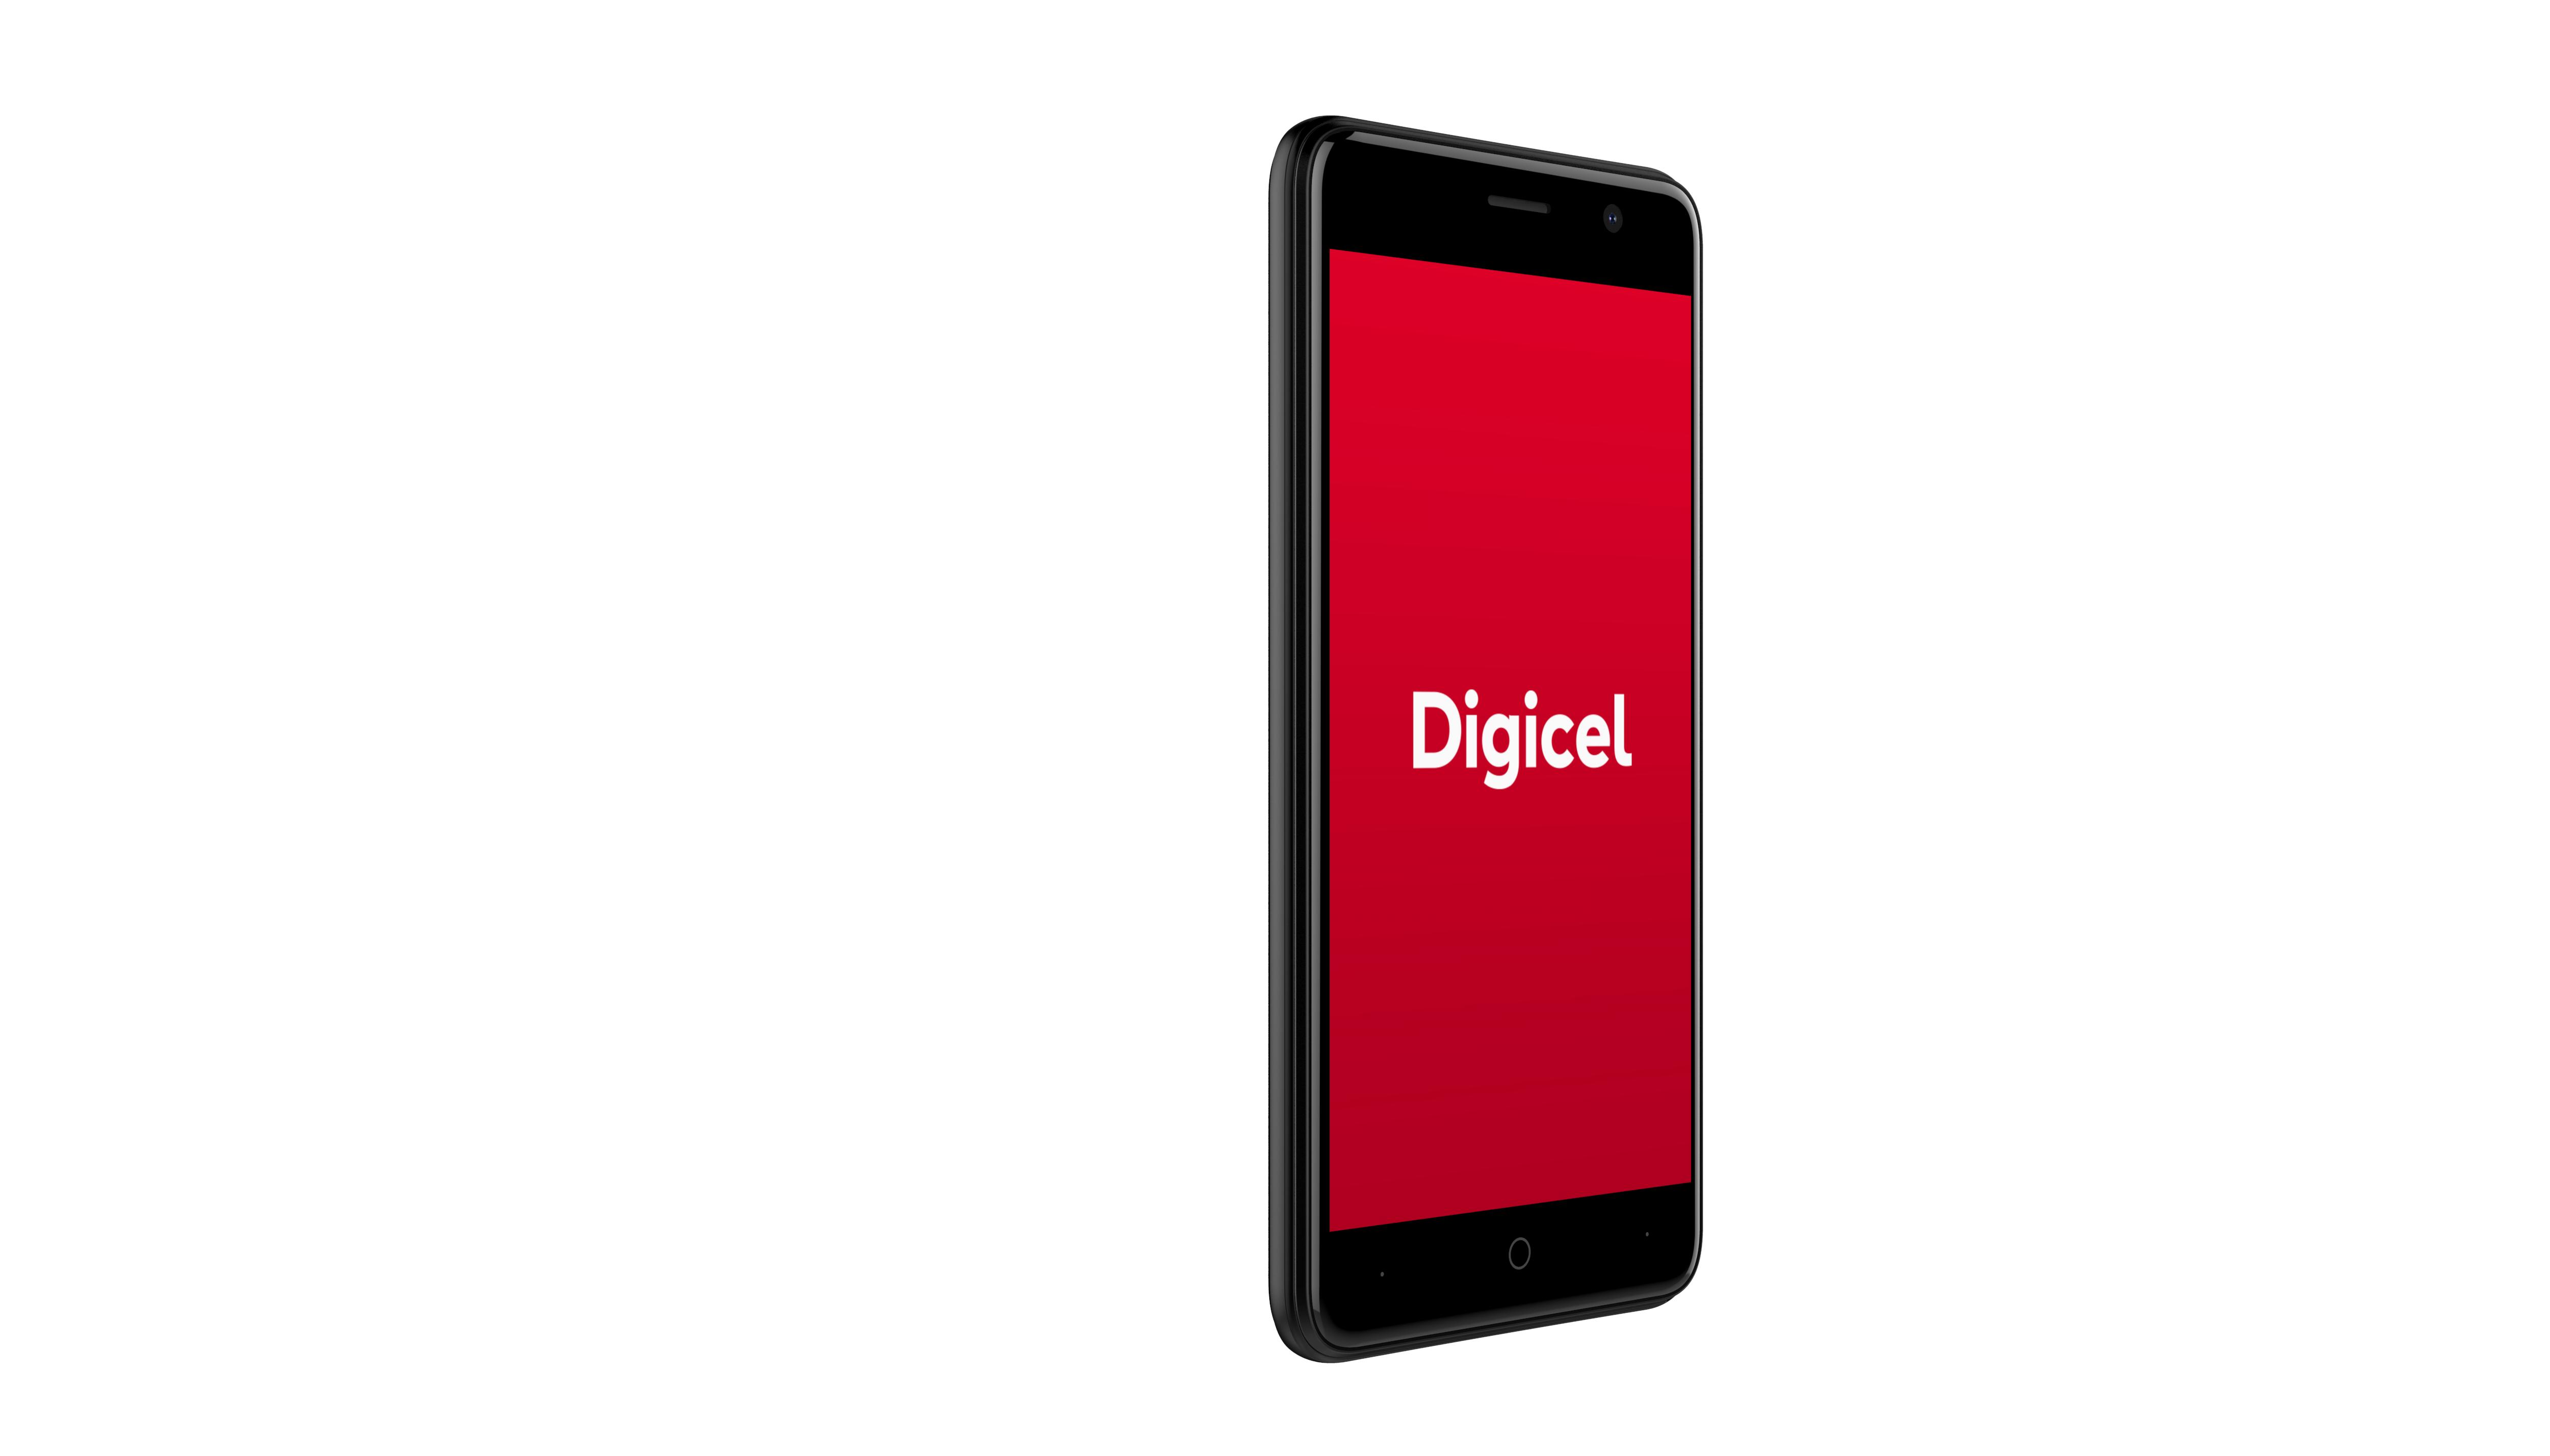 Digicel DL 501